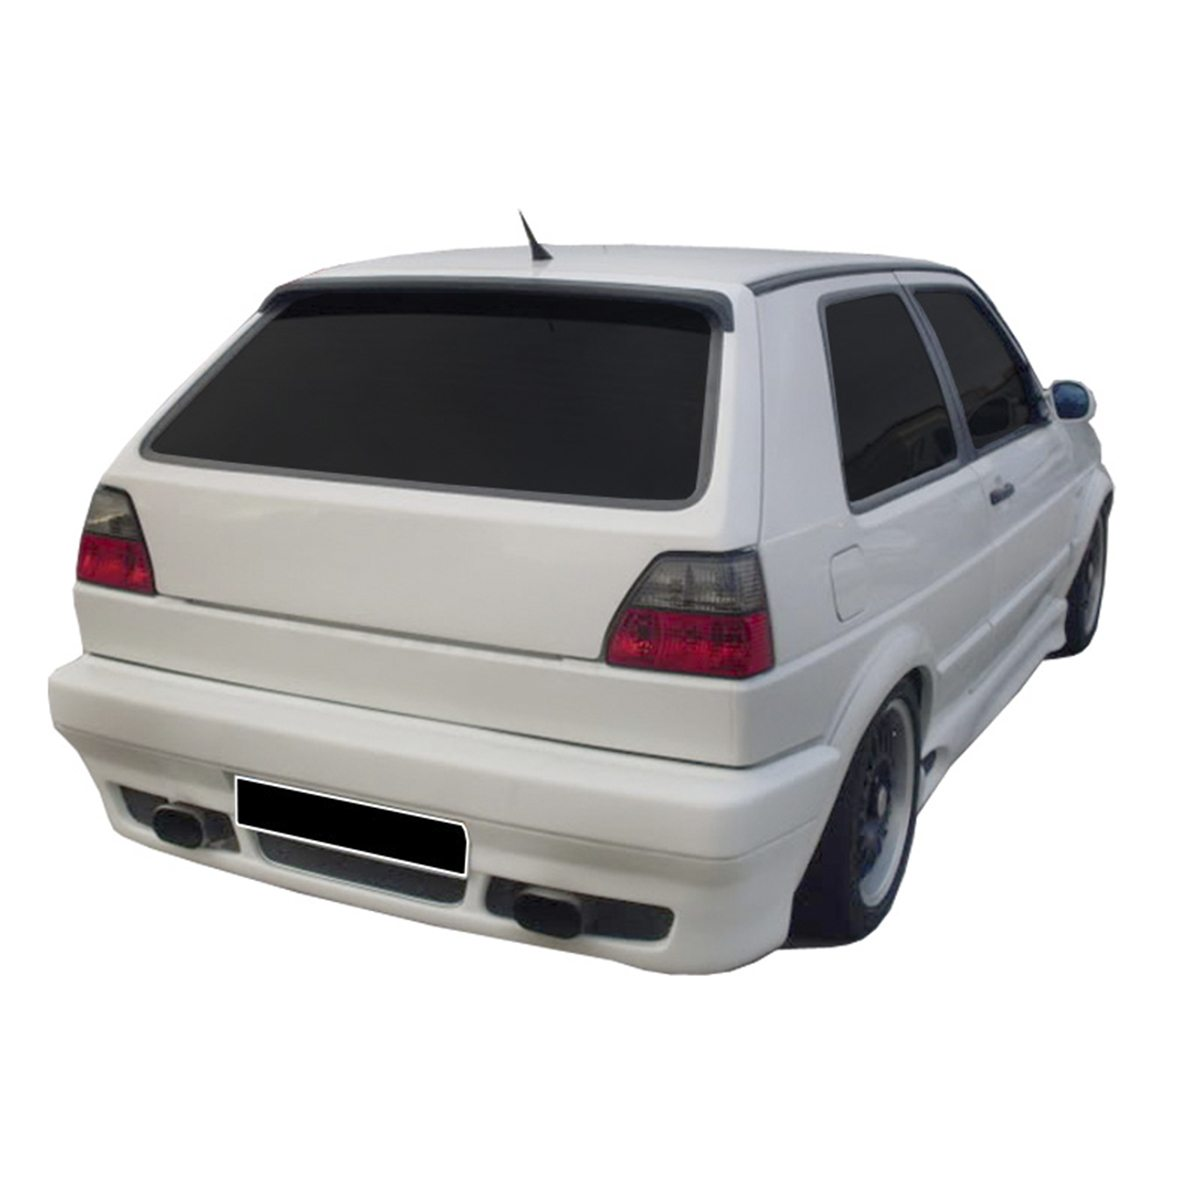 VW-Golf-II-RS-Tras-PCN116